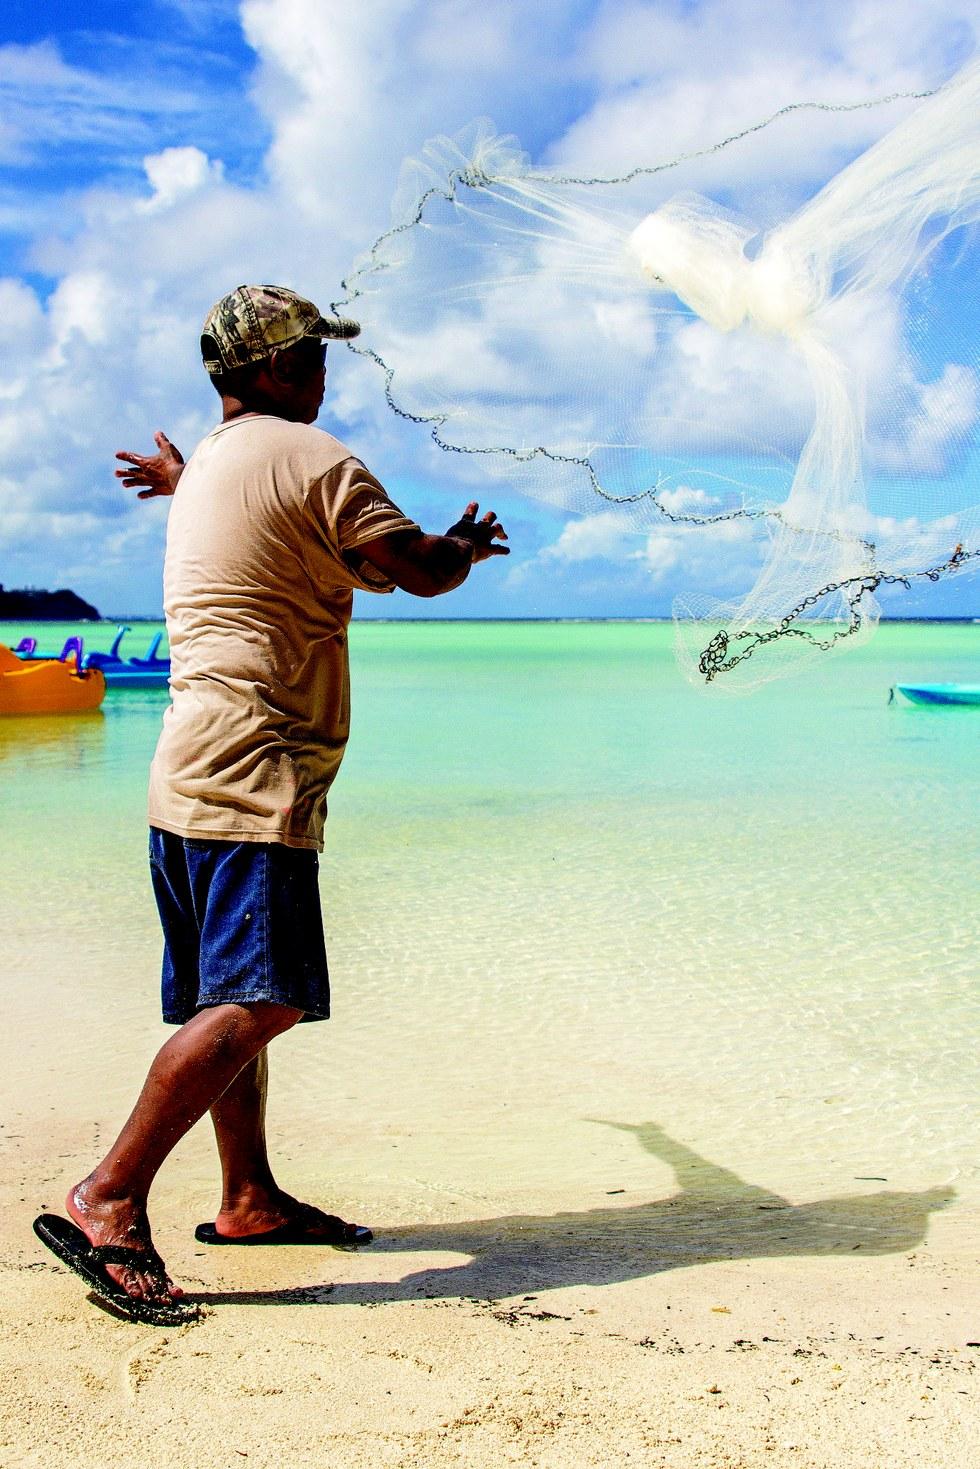 A throw-net fisherman at Tumon Bay